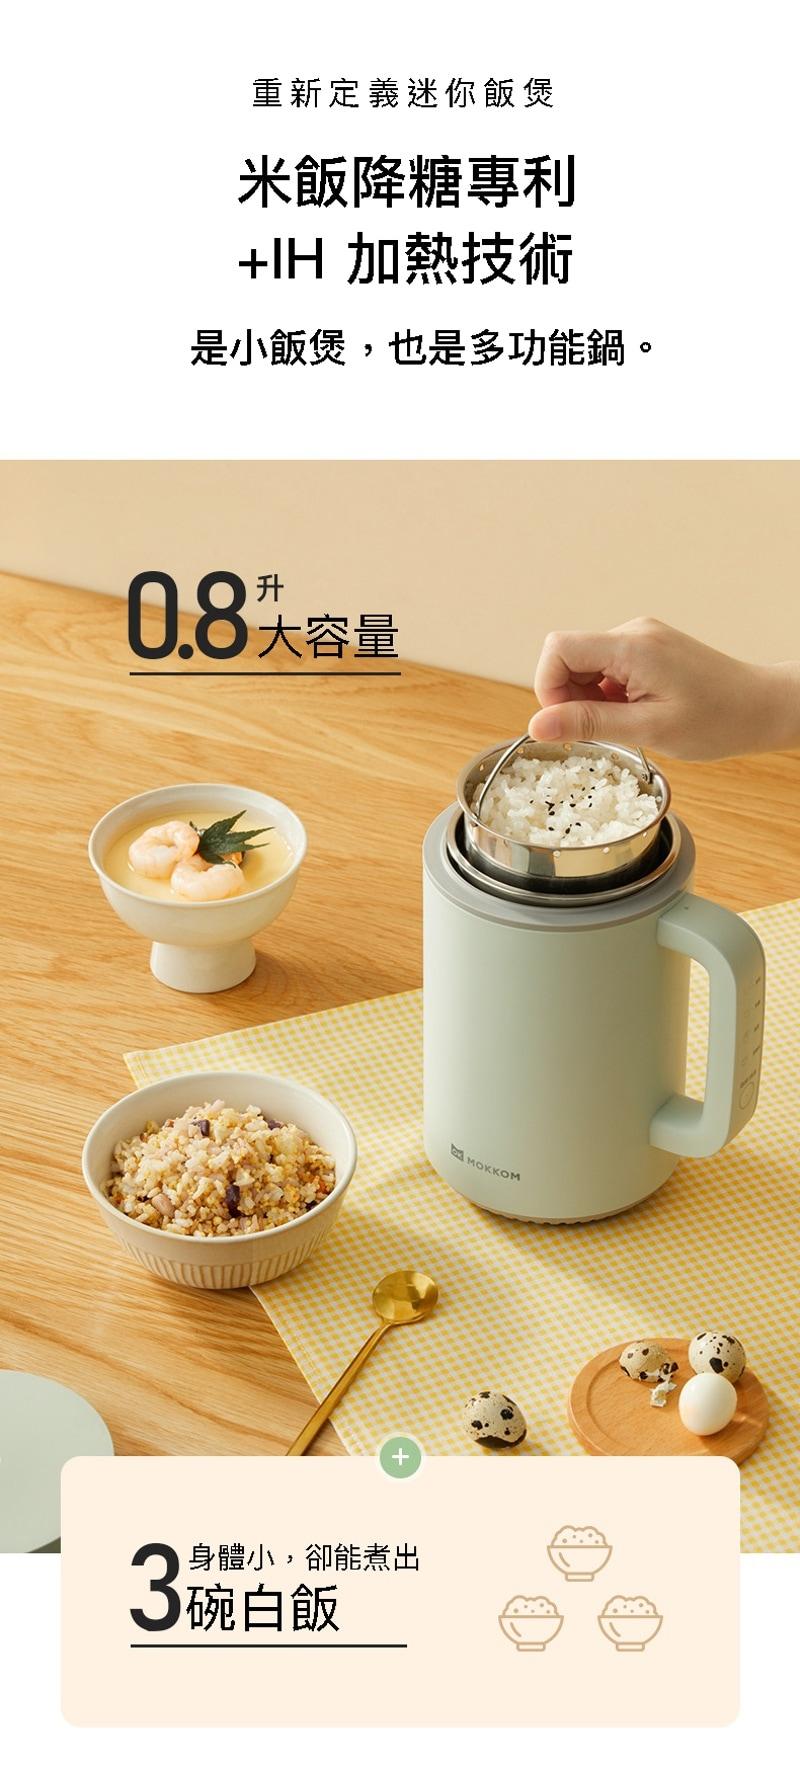 Mokkom 多功能IH脫糖電飯煲 (0.8公升) MK-399